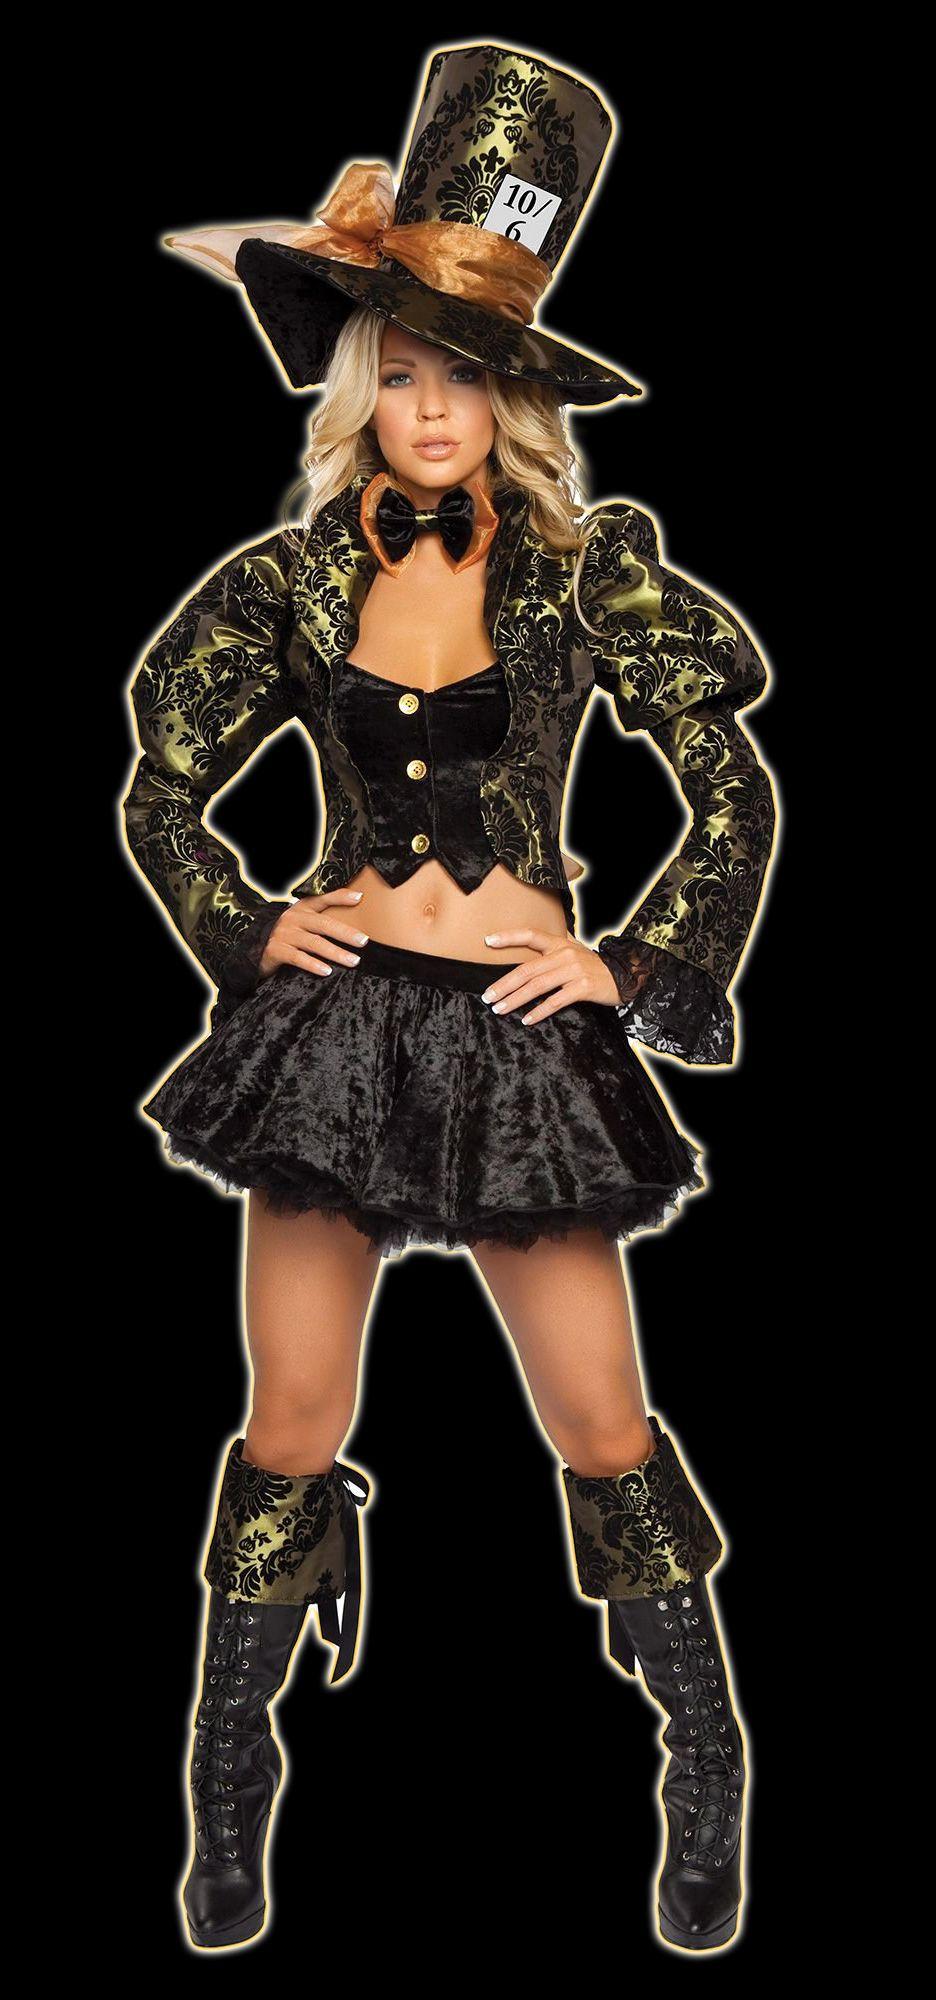 Black & Gold Tea Party Tease Mad Hatter Adult Costume. I really like ...